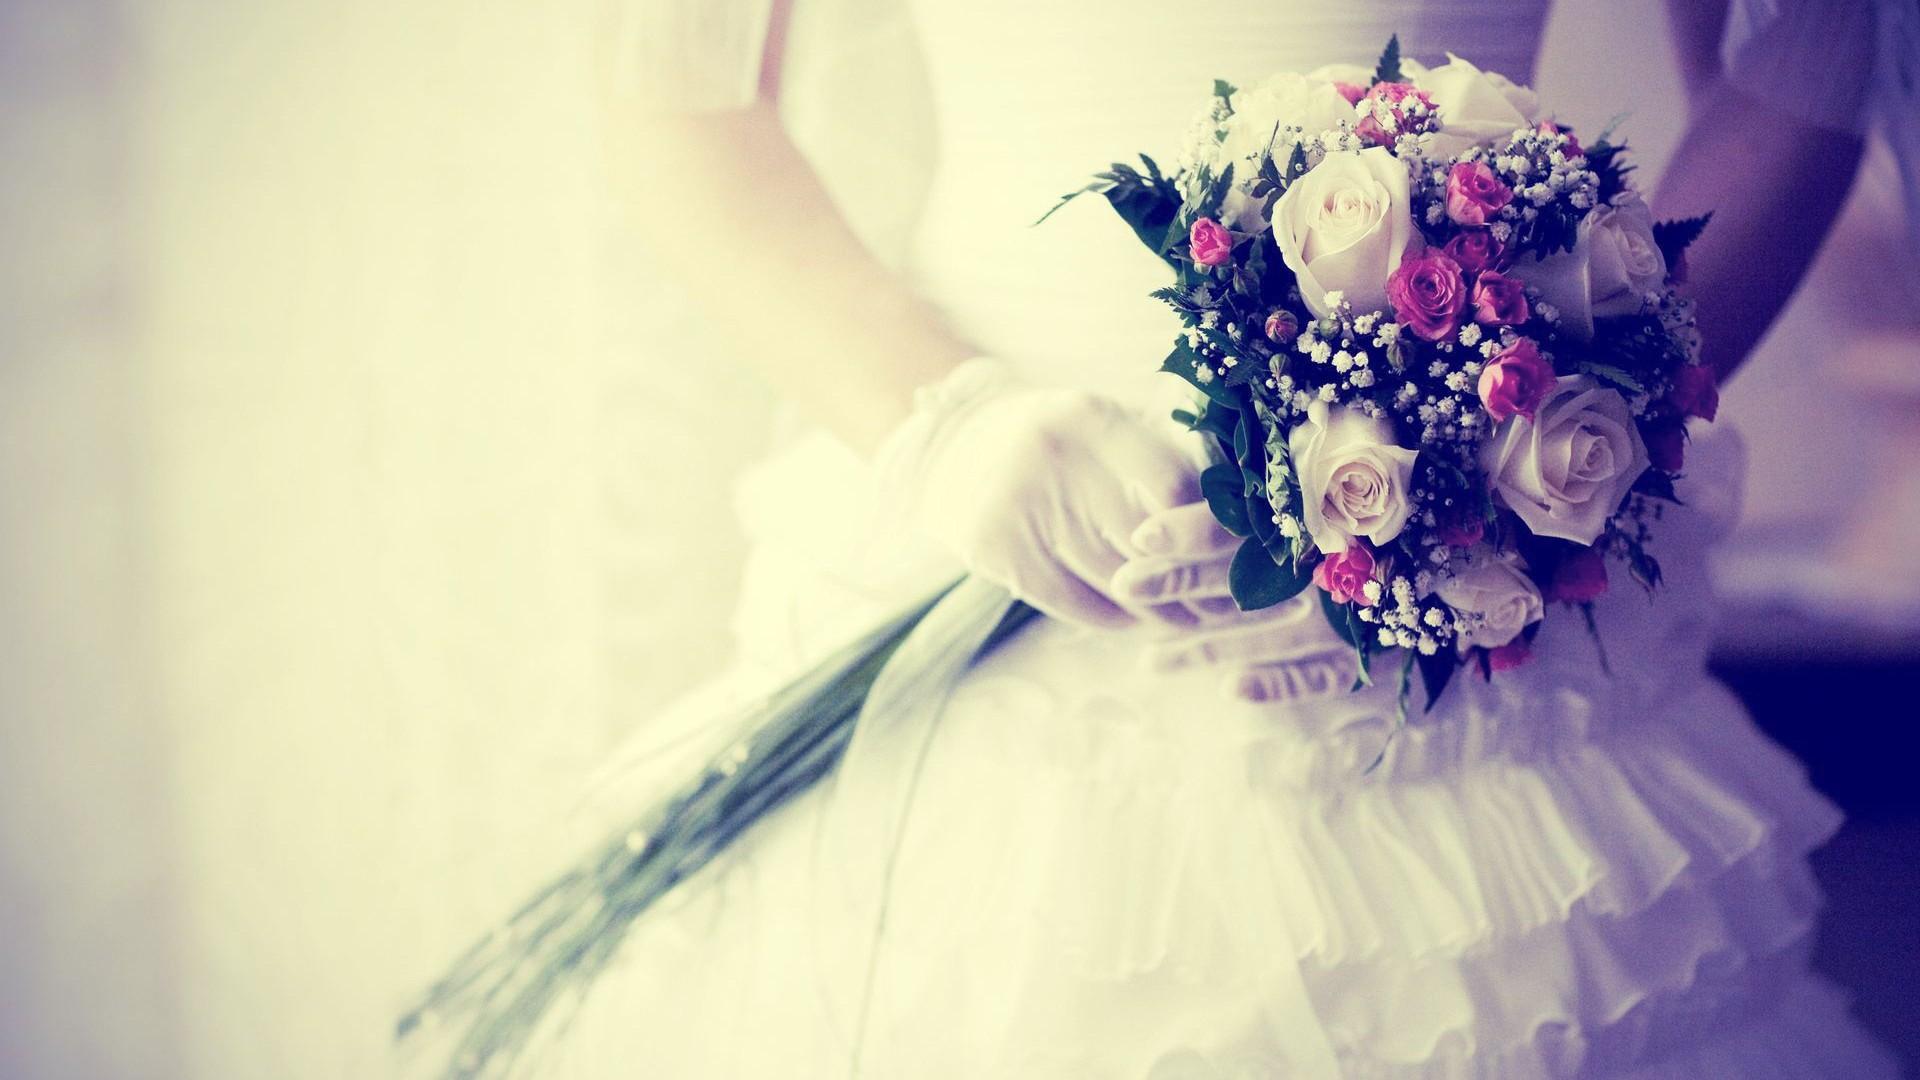 wedding-bride-flowers-wedding-backgrounds-bride-flowers-wedding-25963